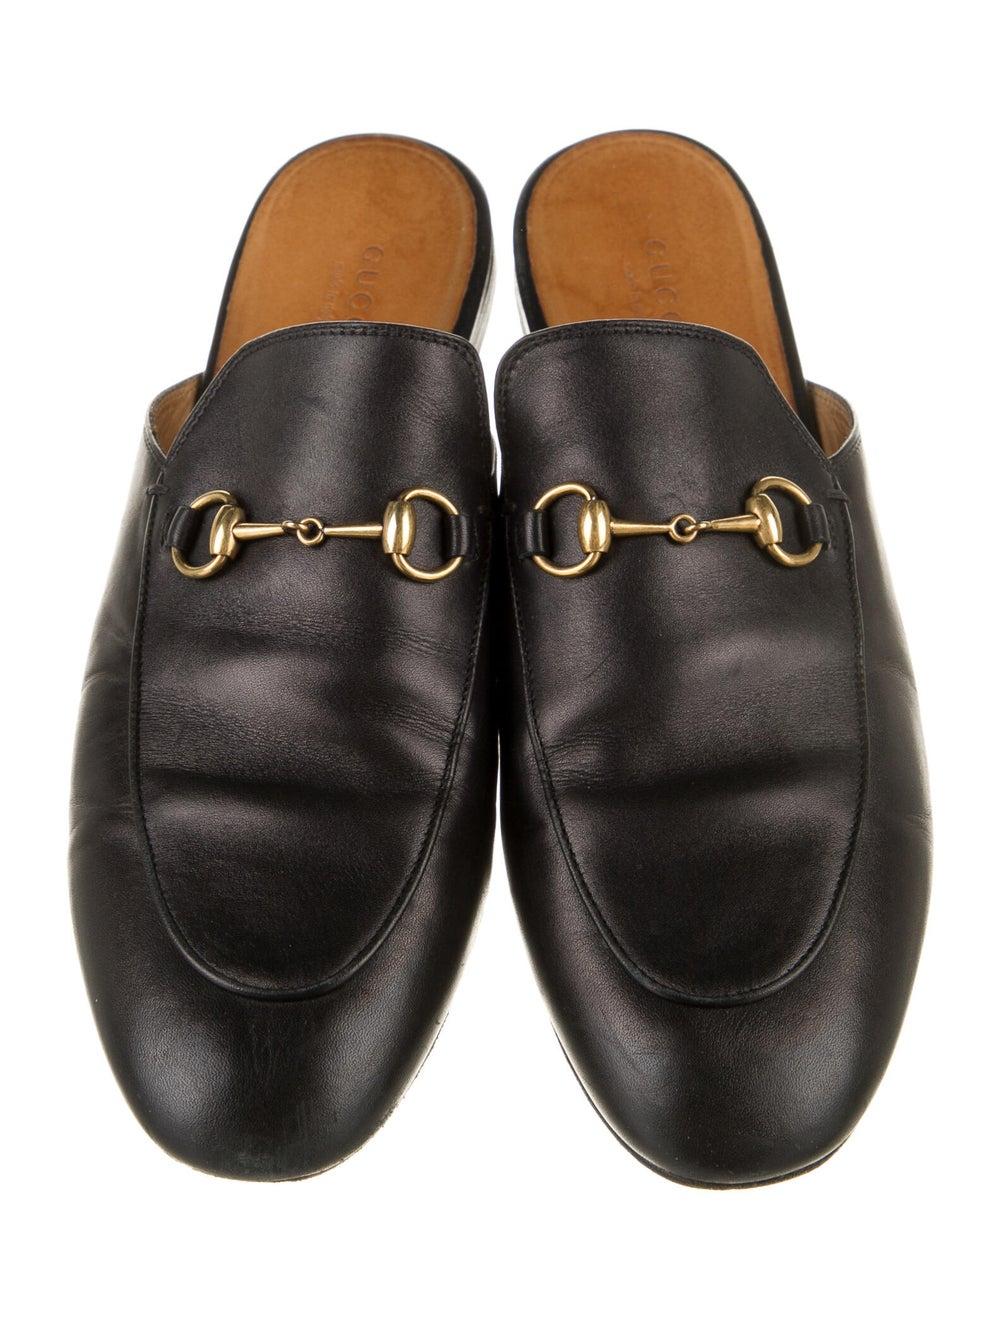 Gucci Princetown Horsebit Accent Mules Black - image 3